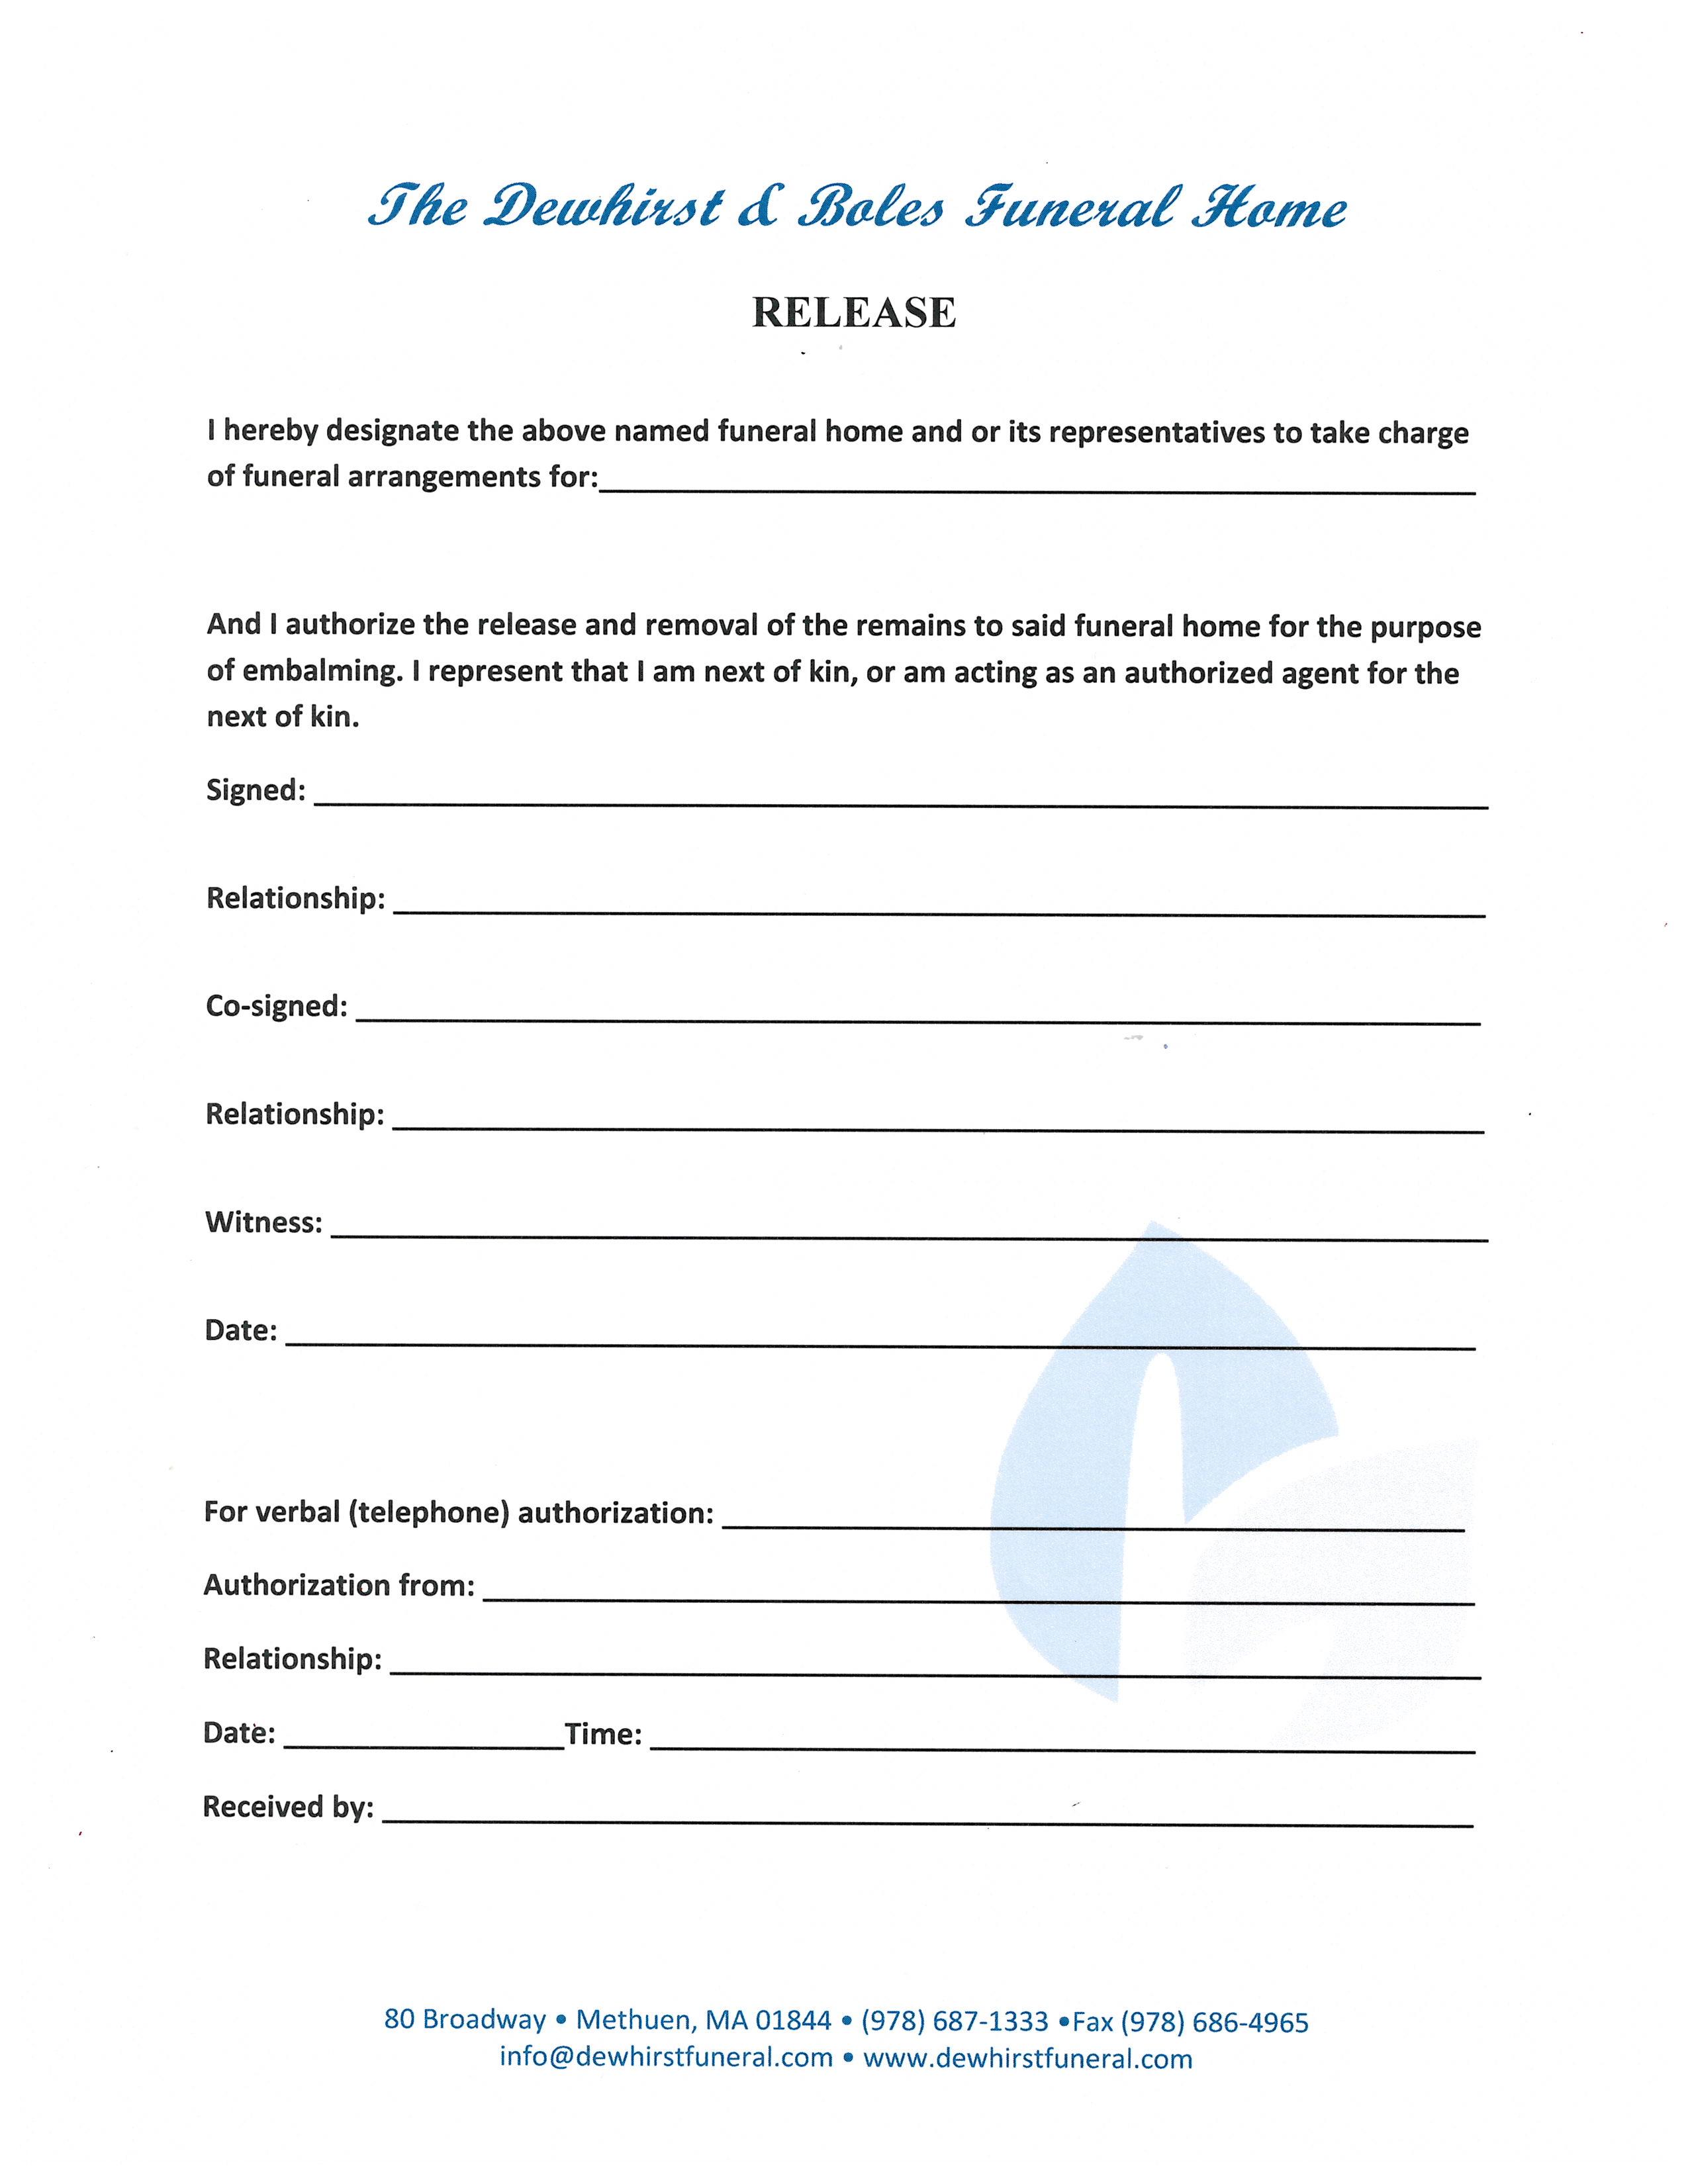 Arrangement Forms | Dewhirst & Boles Funeral Home | Methuen